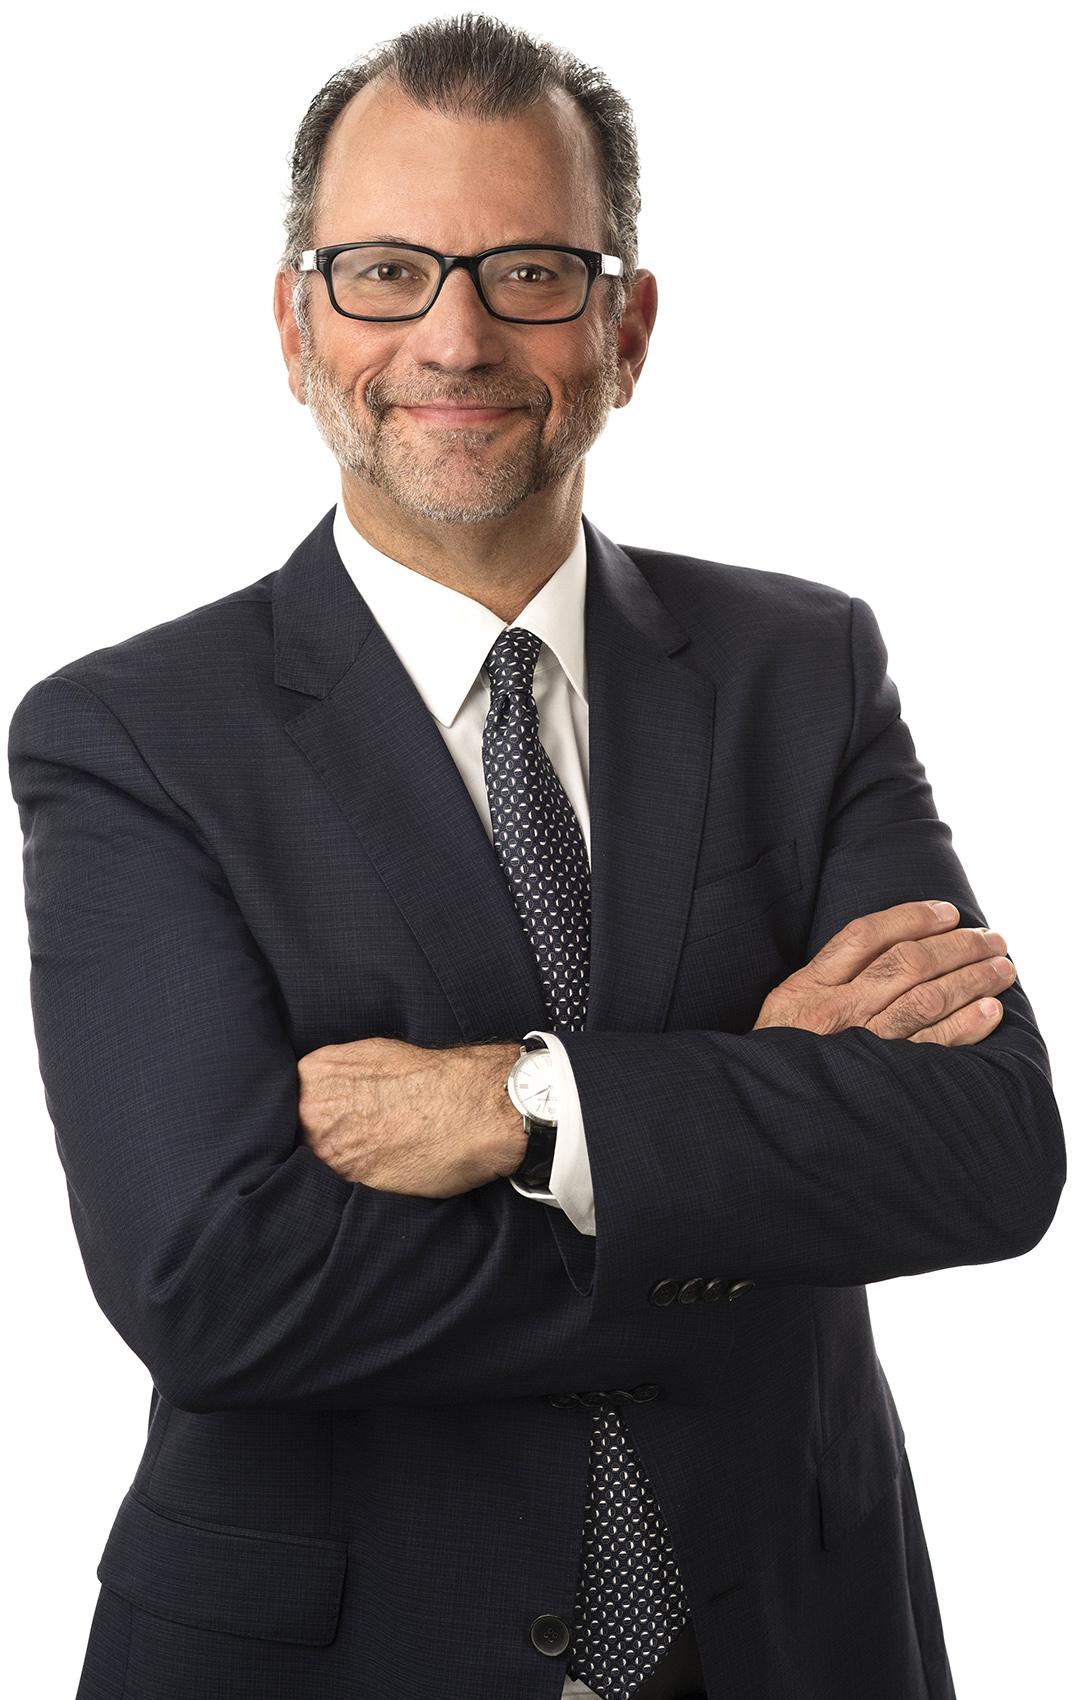 Kevin M. Colton